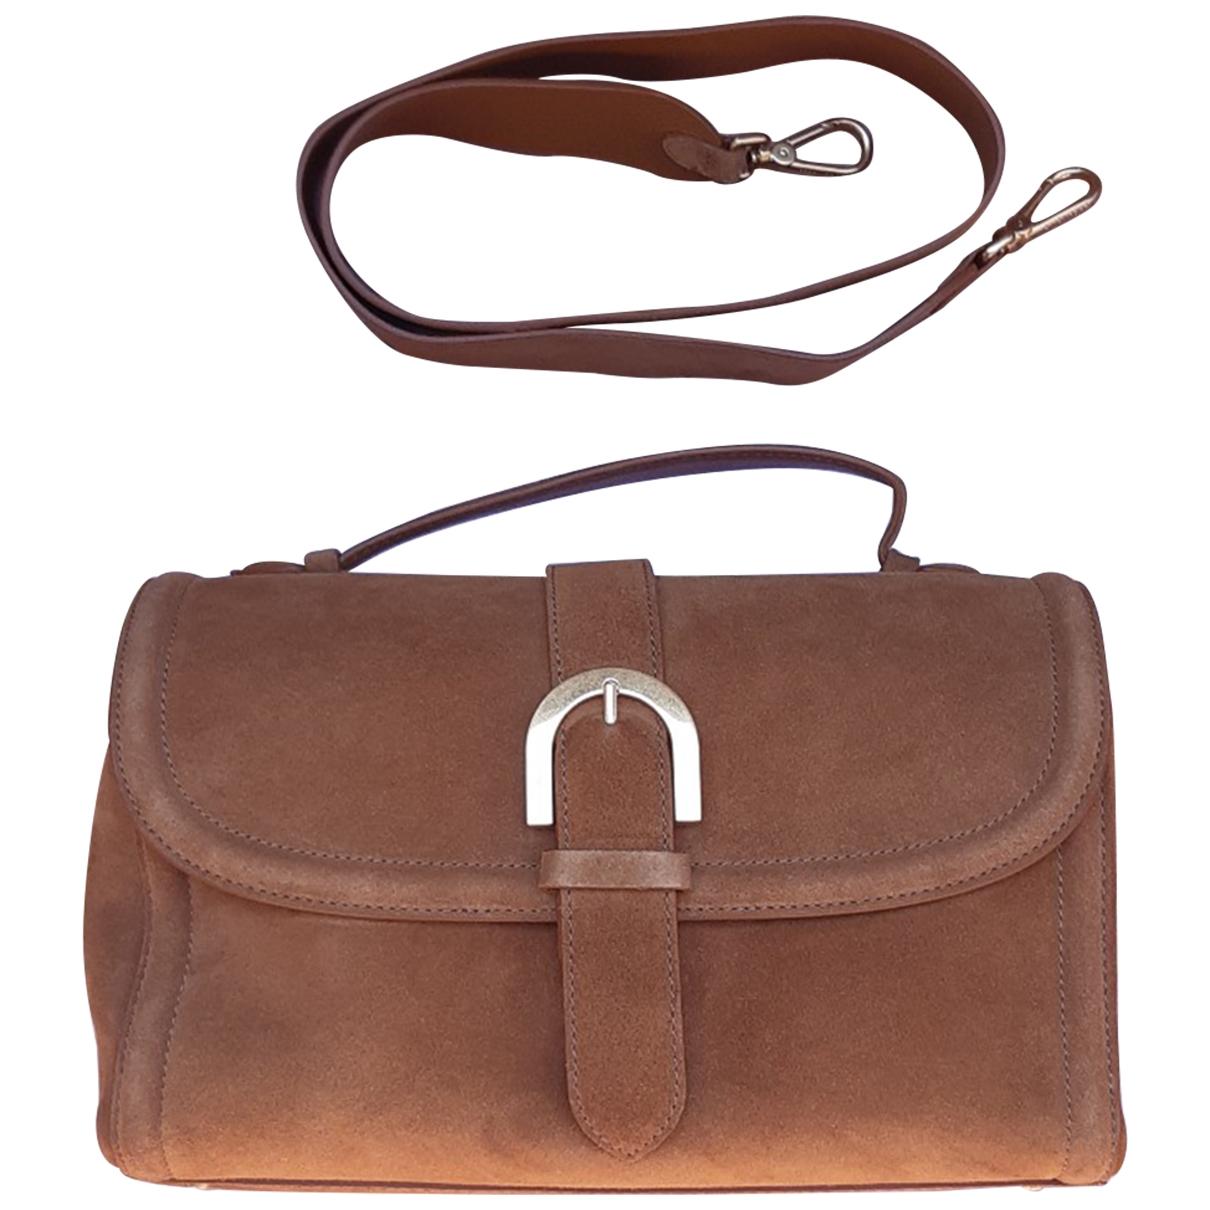 Coccinelle \N Camel Suede handbag for Women \N